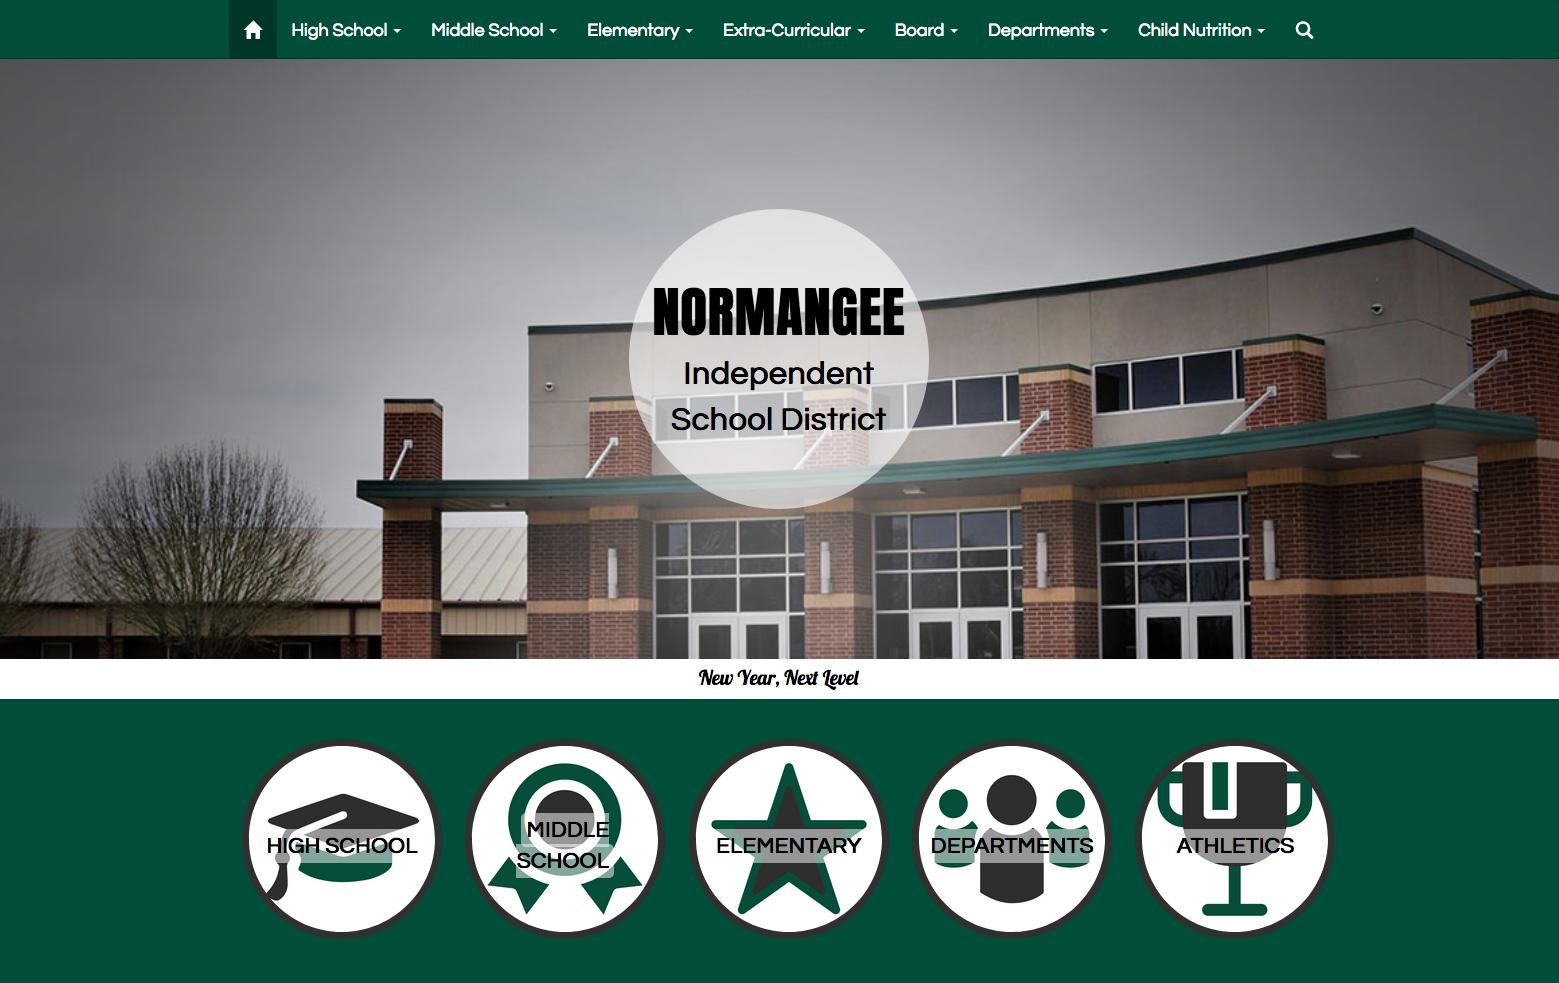 Normangee ISD